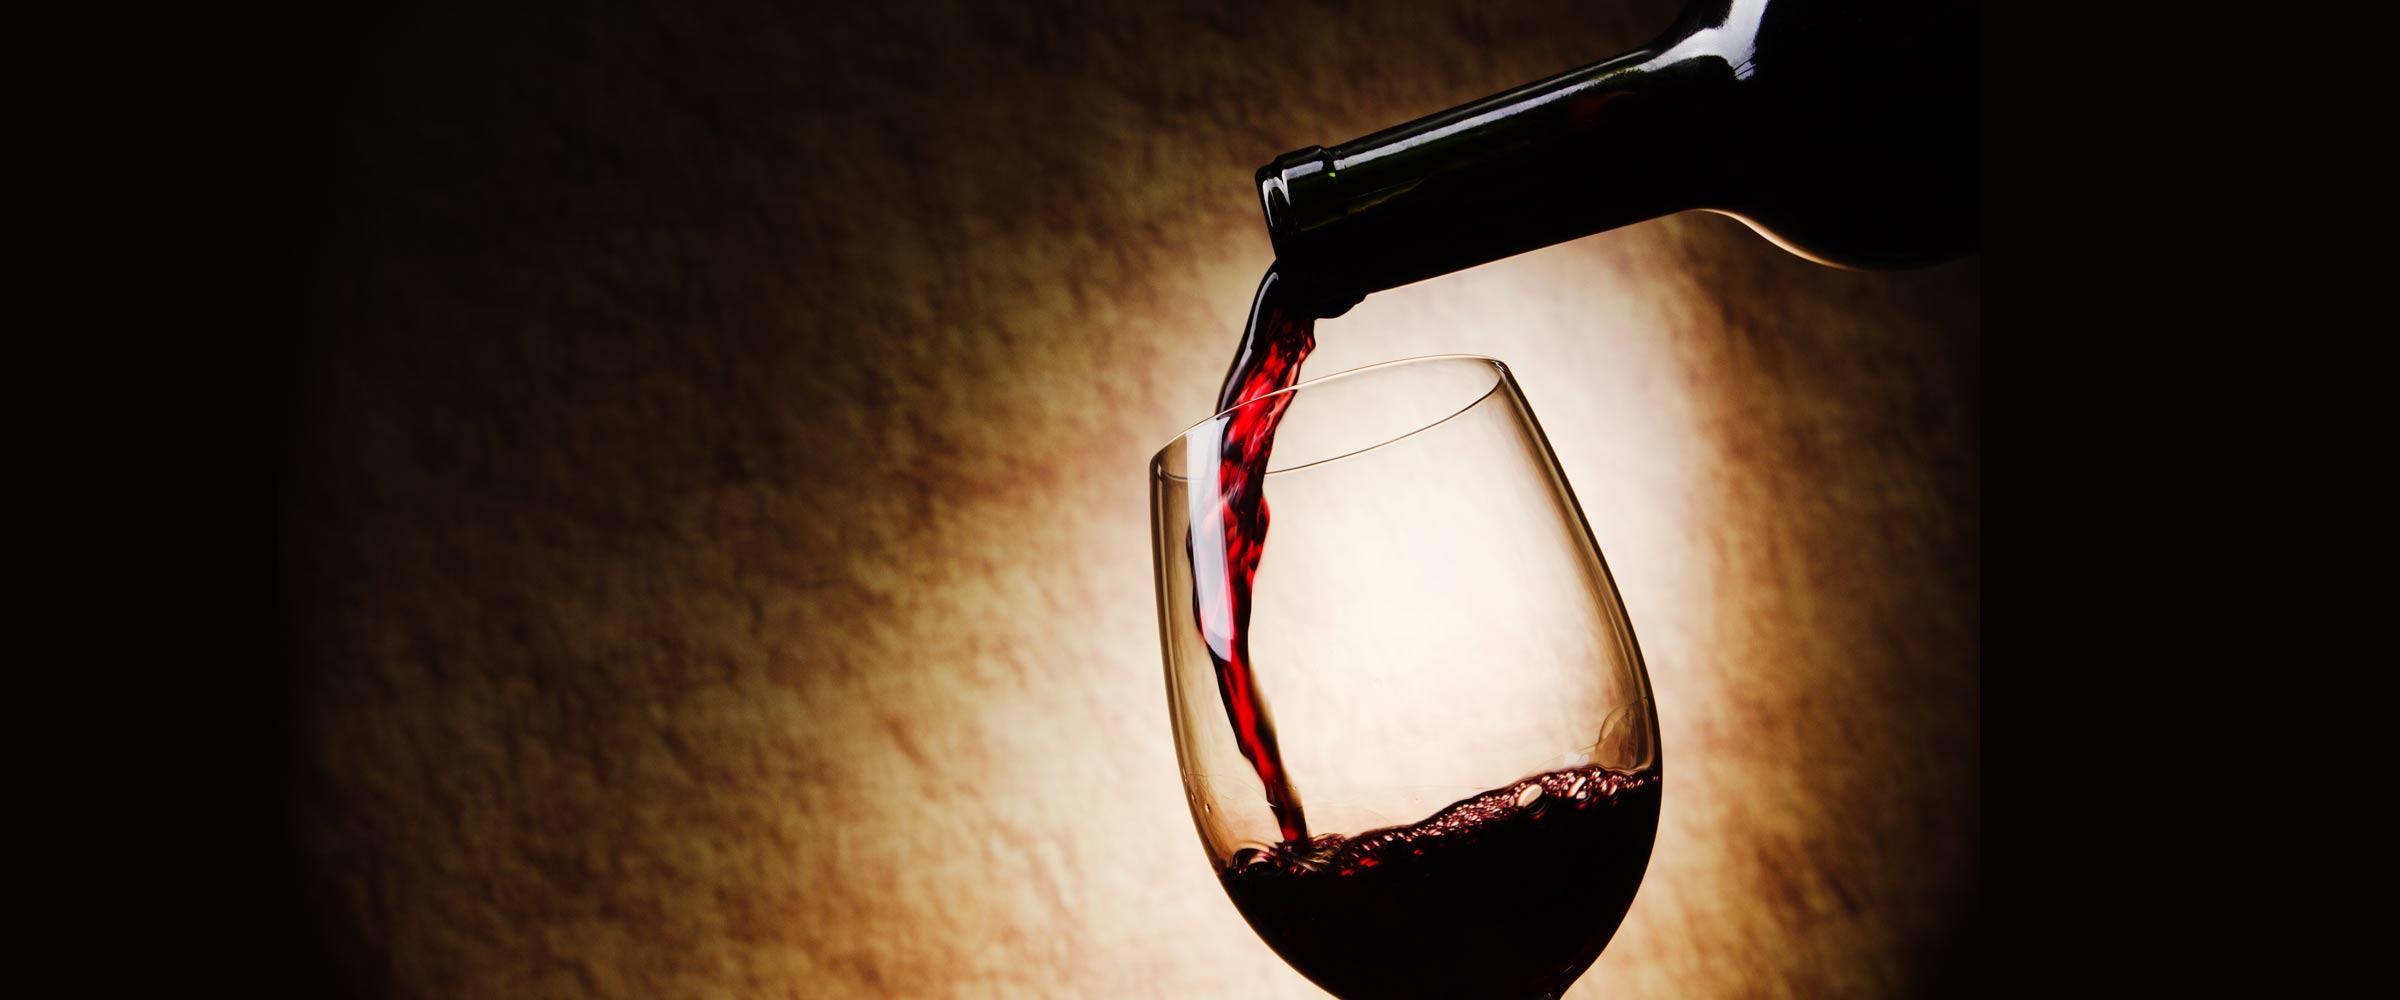 virgo wine